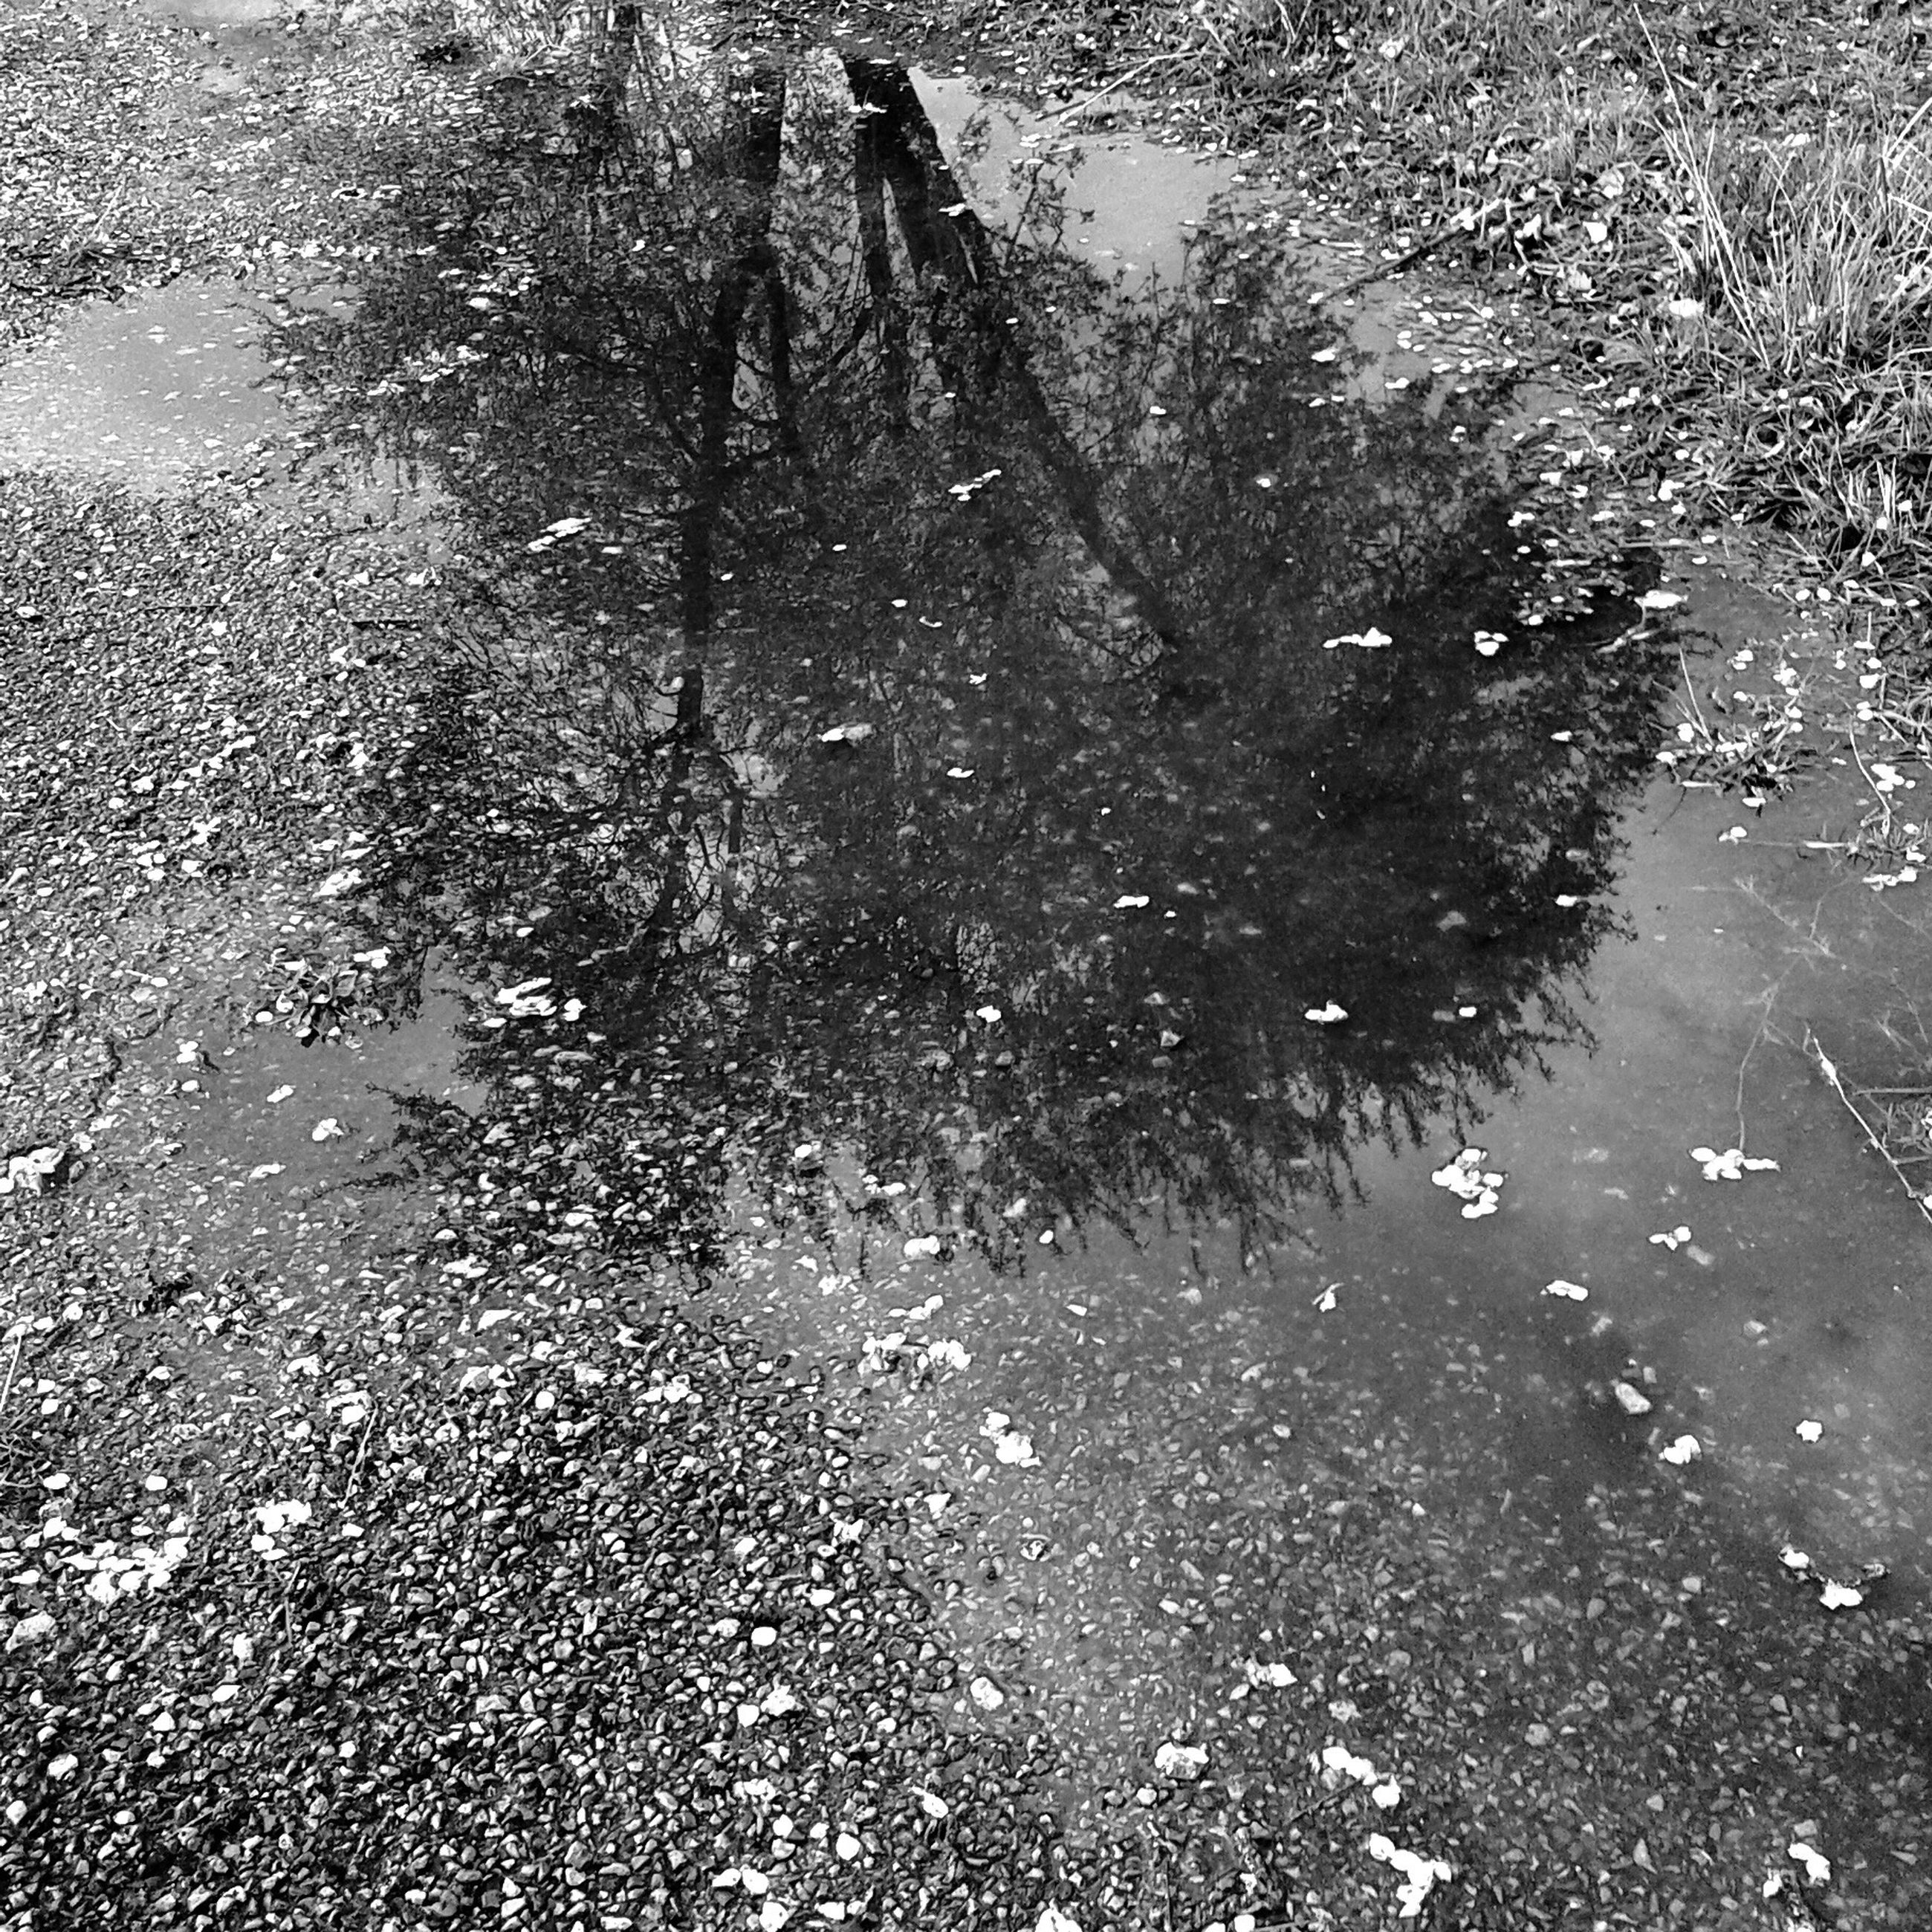 wet, drop, rain, water, window, glass - material, transparent, raindrop, weather, season, full frame, backgrounds, indoors, monsoon, glass, close-up, rainy season, rainy, water drop, droplet